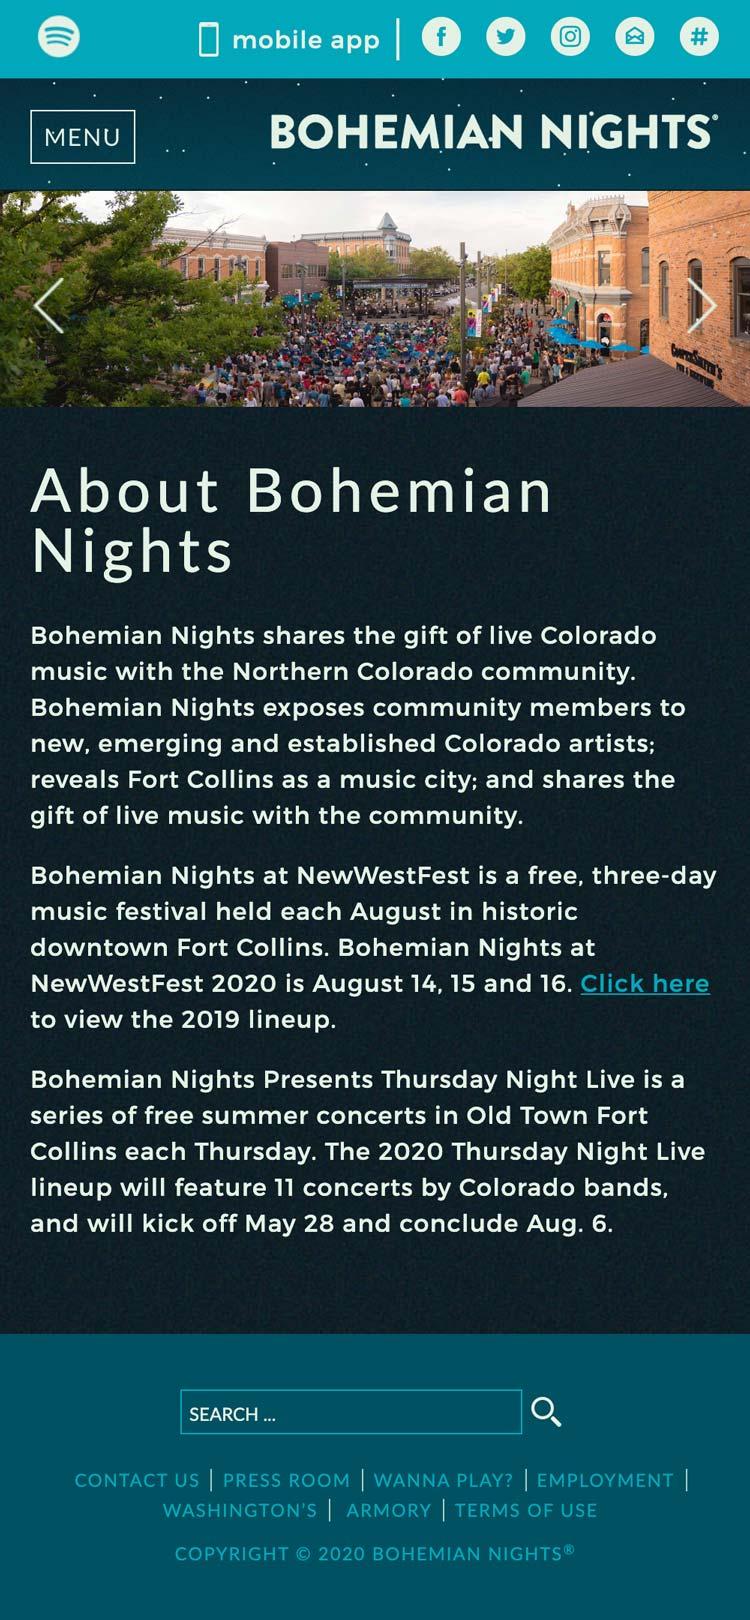 Bohemian Nights - Nonprofit Website Design